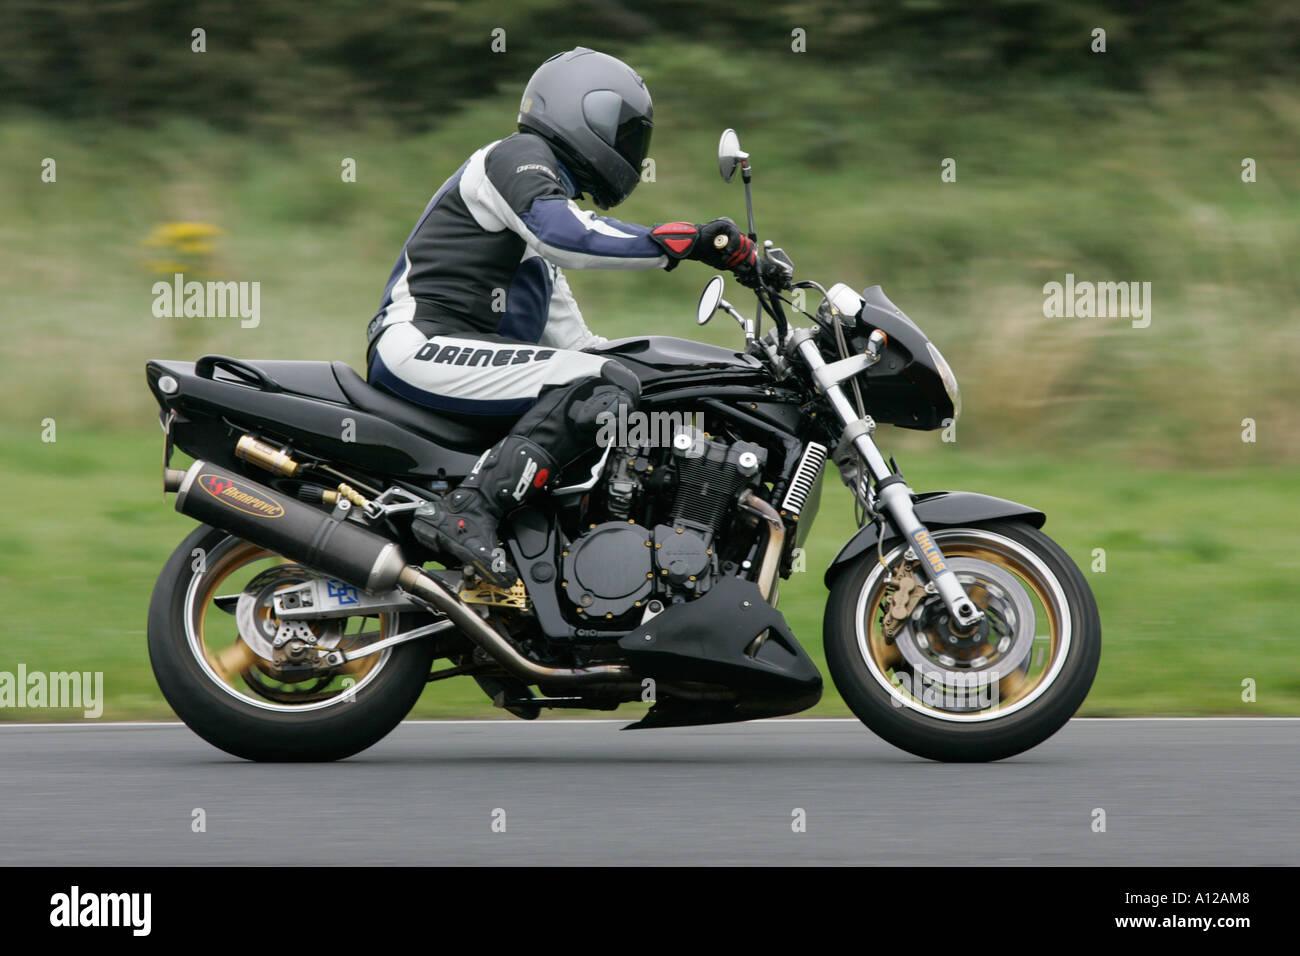 SUZUKI RACING CAP GRAND PRIX MOTO GP MOTORCYCLE GSXR GSX HAYABUSA DL DR VITARA R